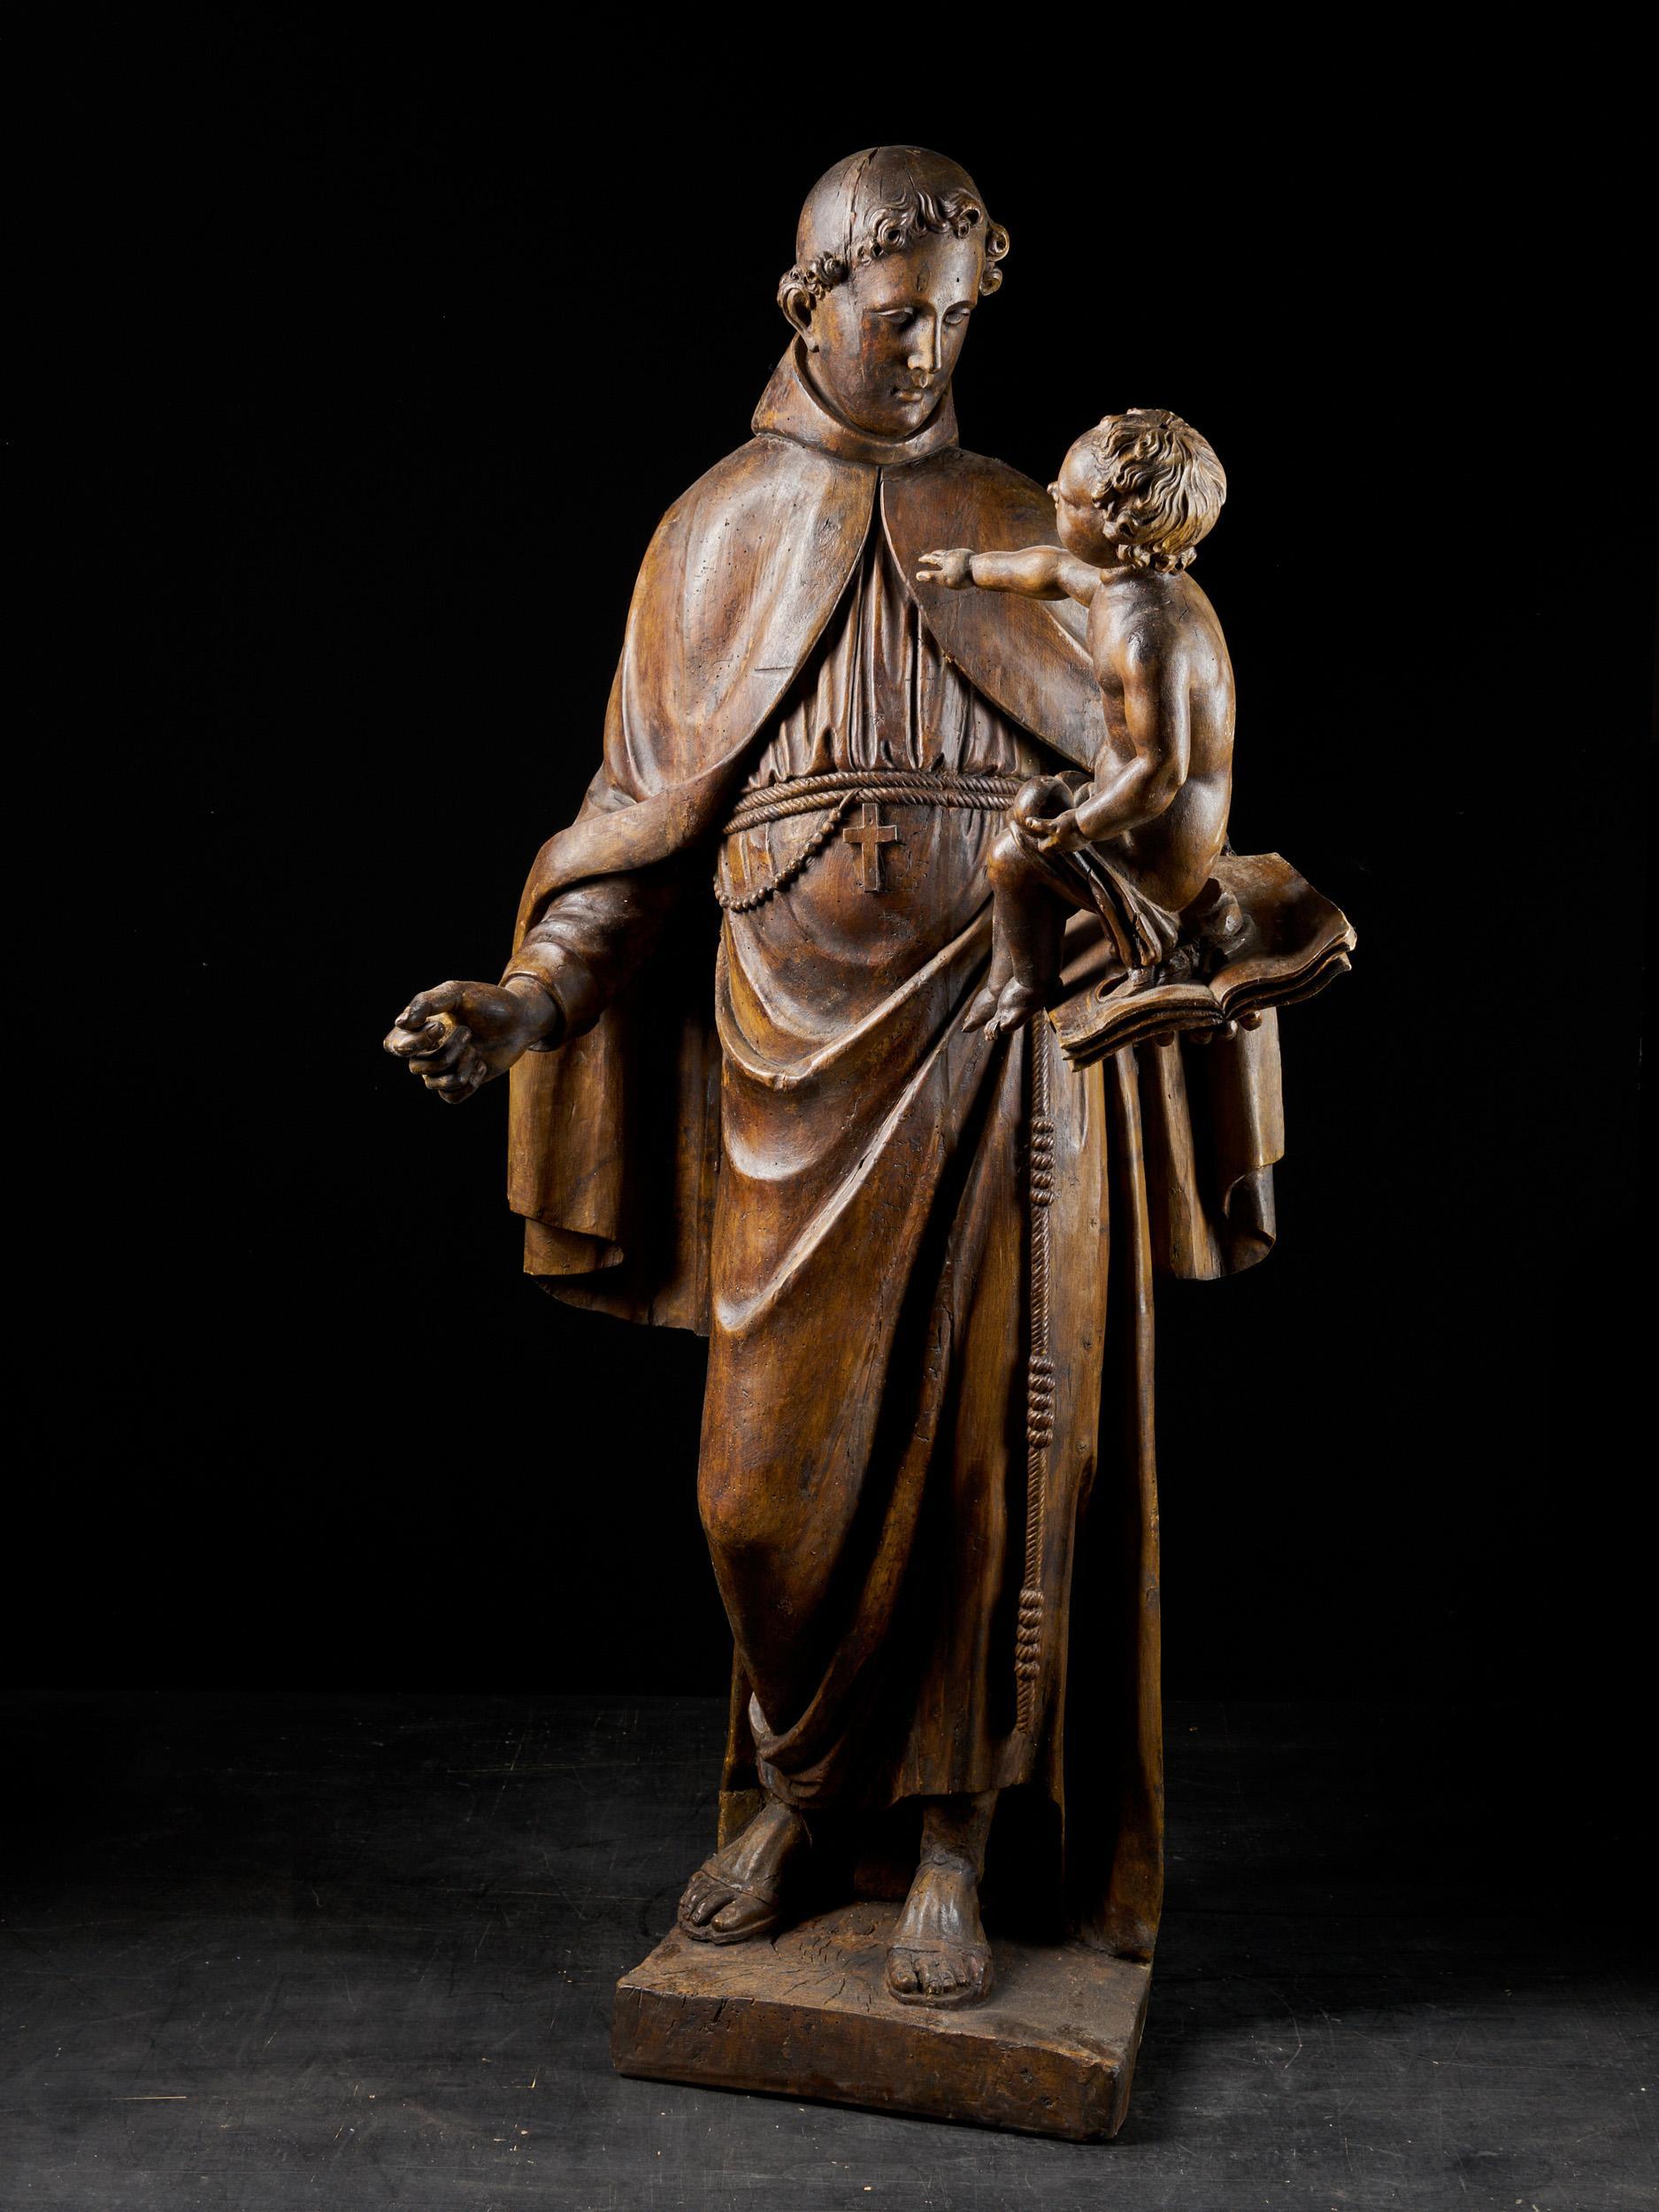 Late 17th C, Baroque, Saint, Italian School, Wooden Sculpture of Saint Anthony